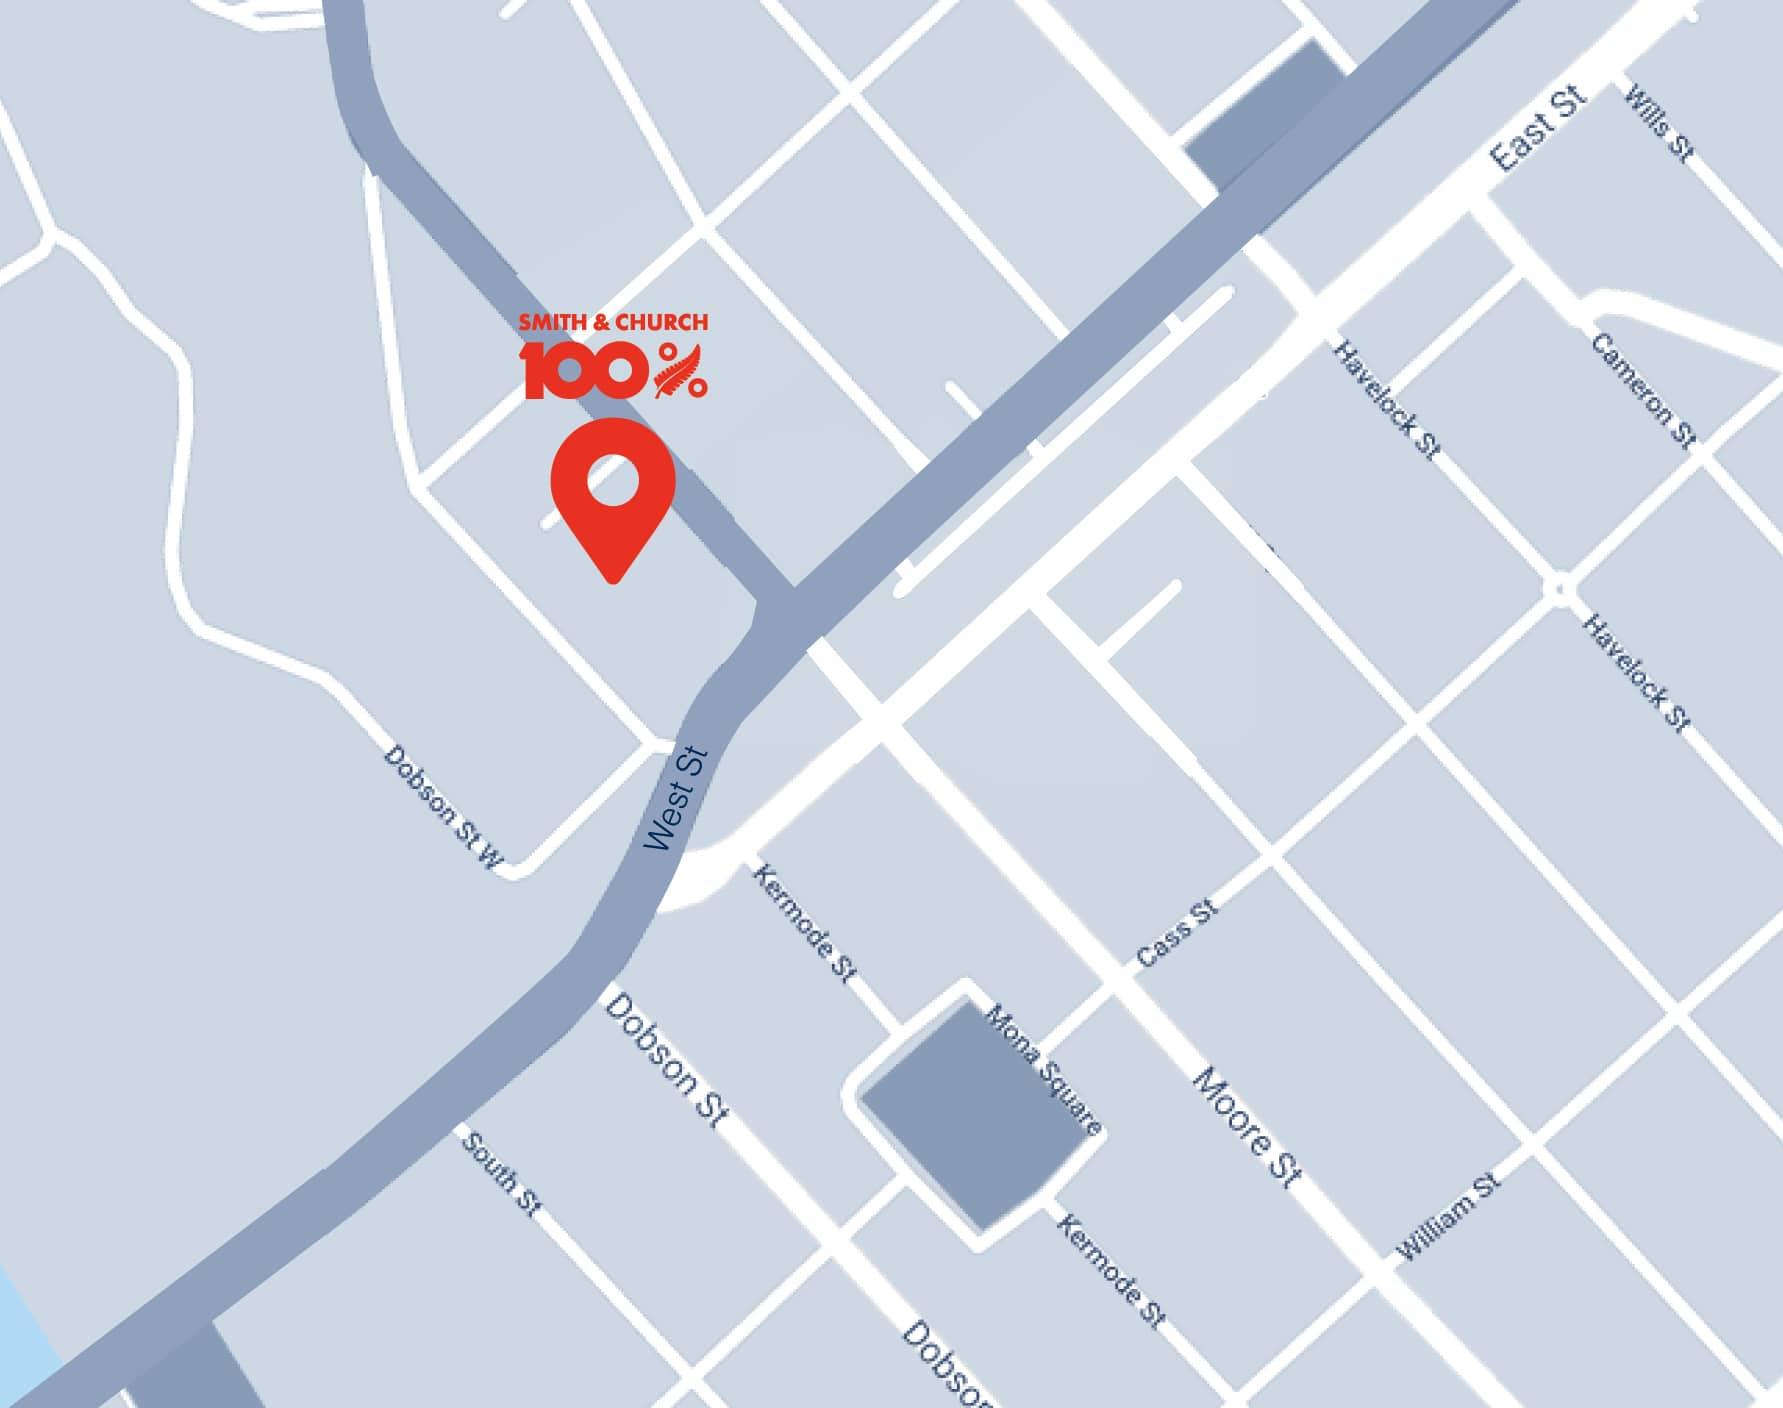 100% Smith & Church ElectraServe 642x507 Map 200dpi